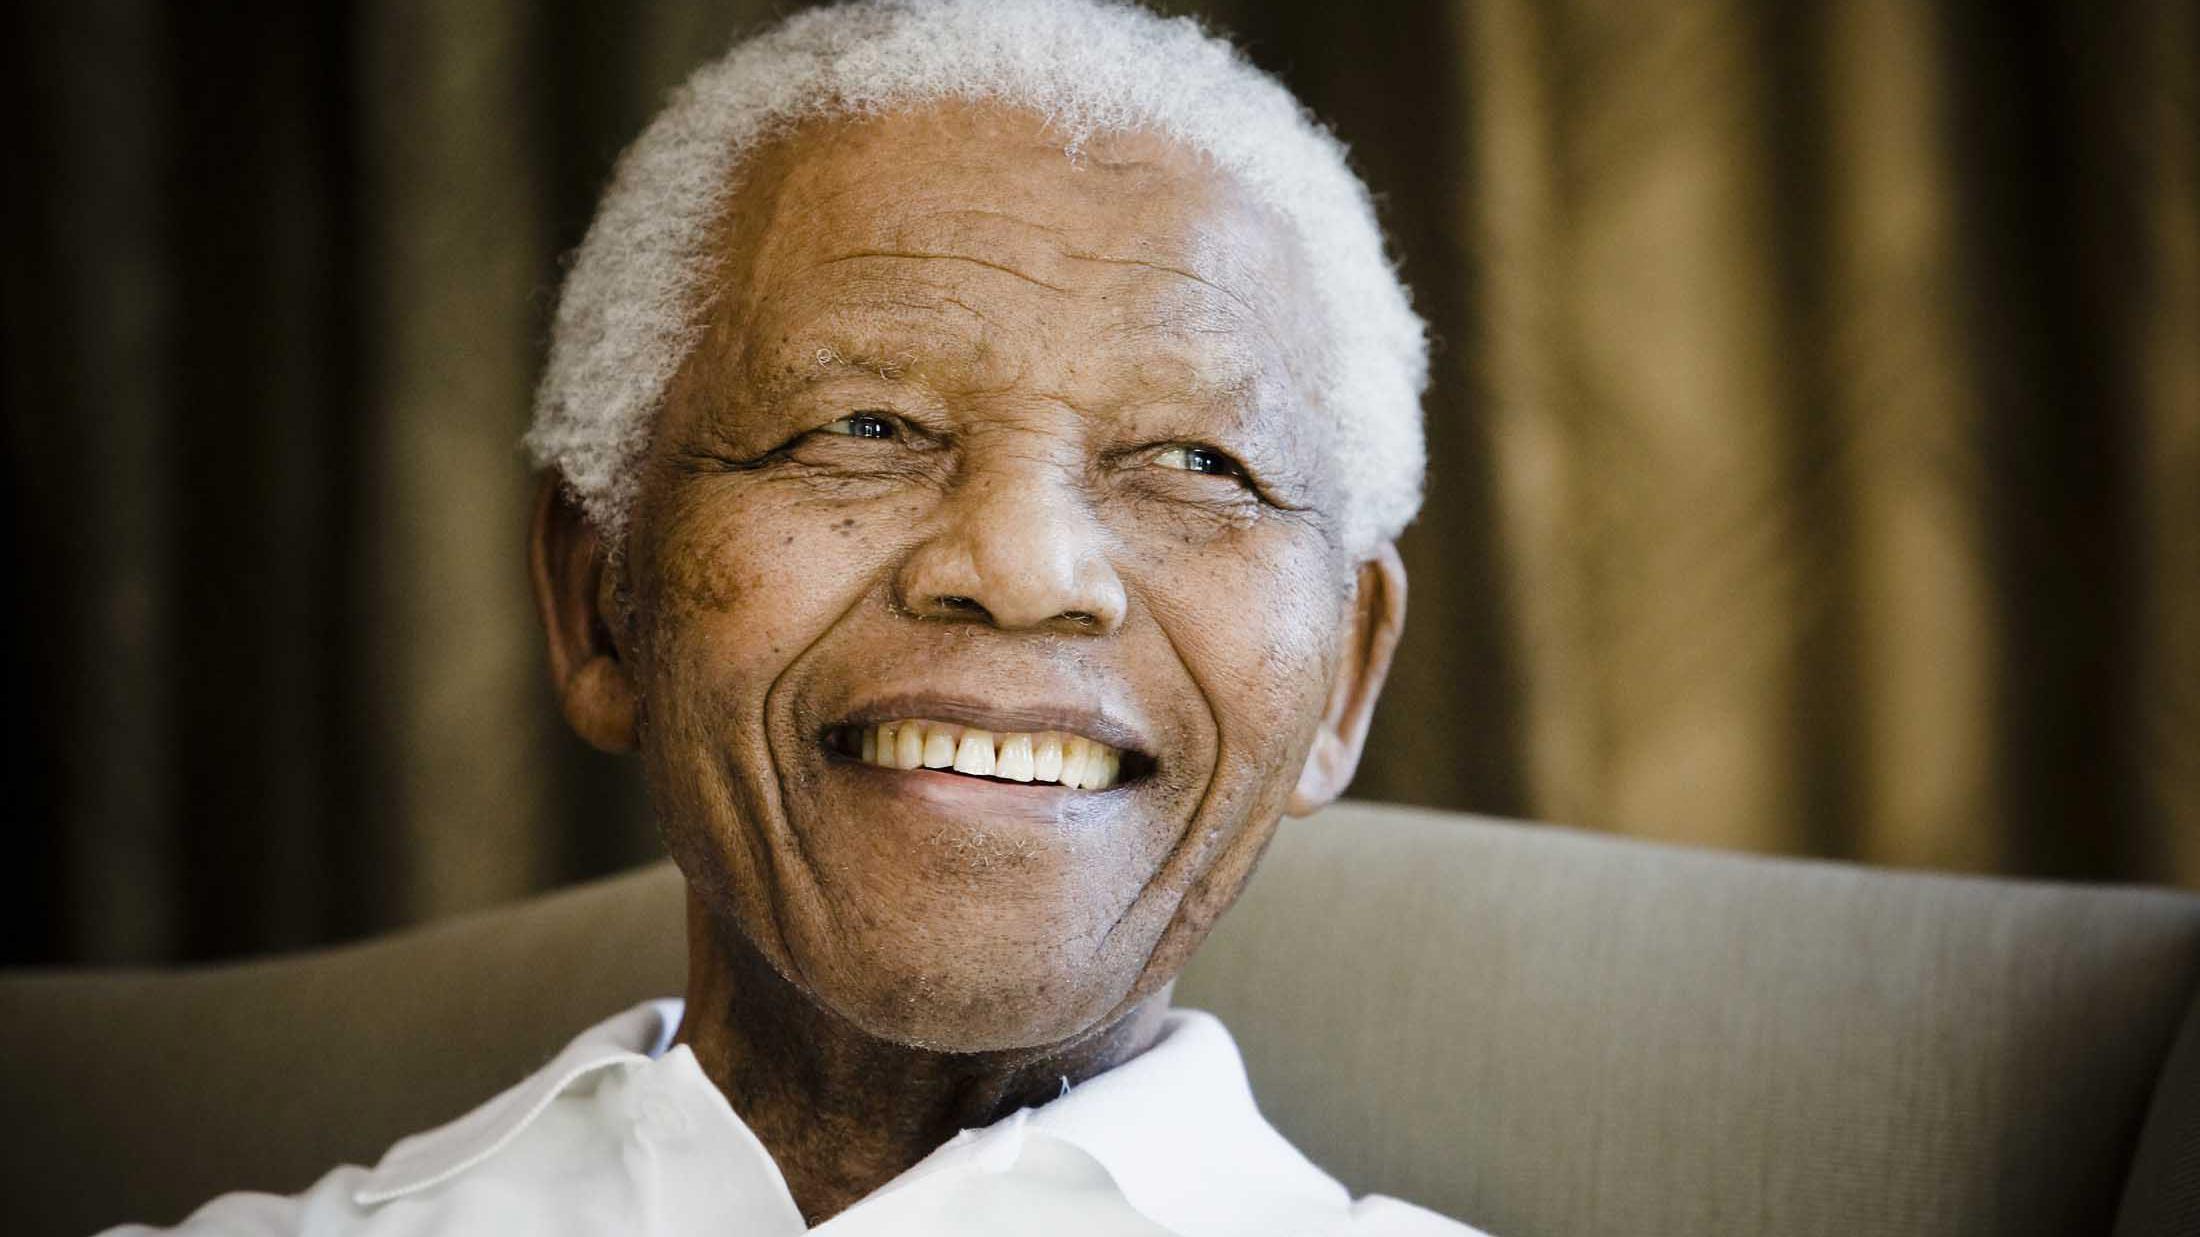 Nelson Mandela: His Written Legacy